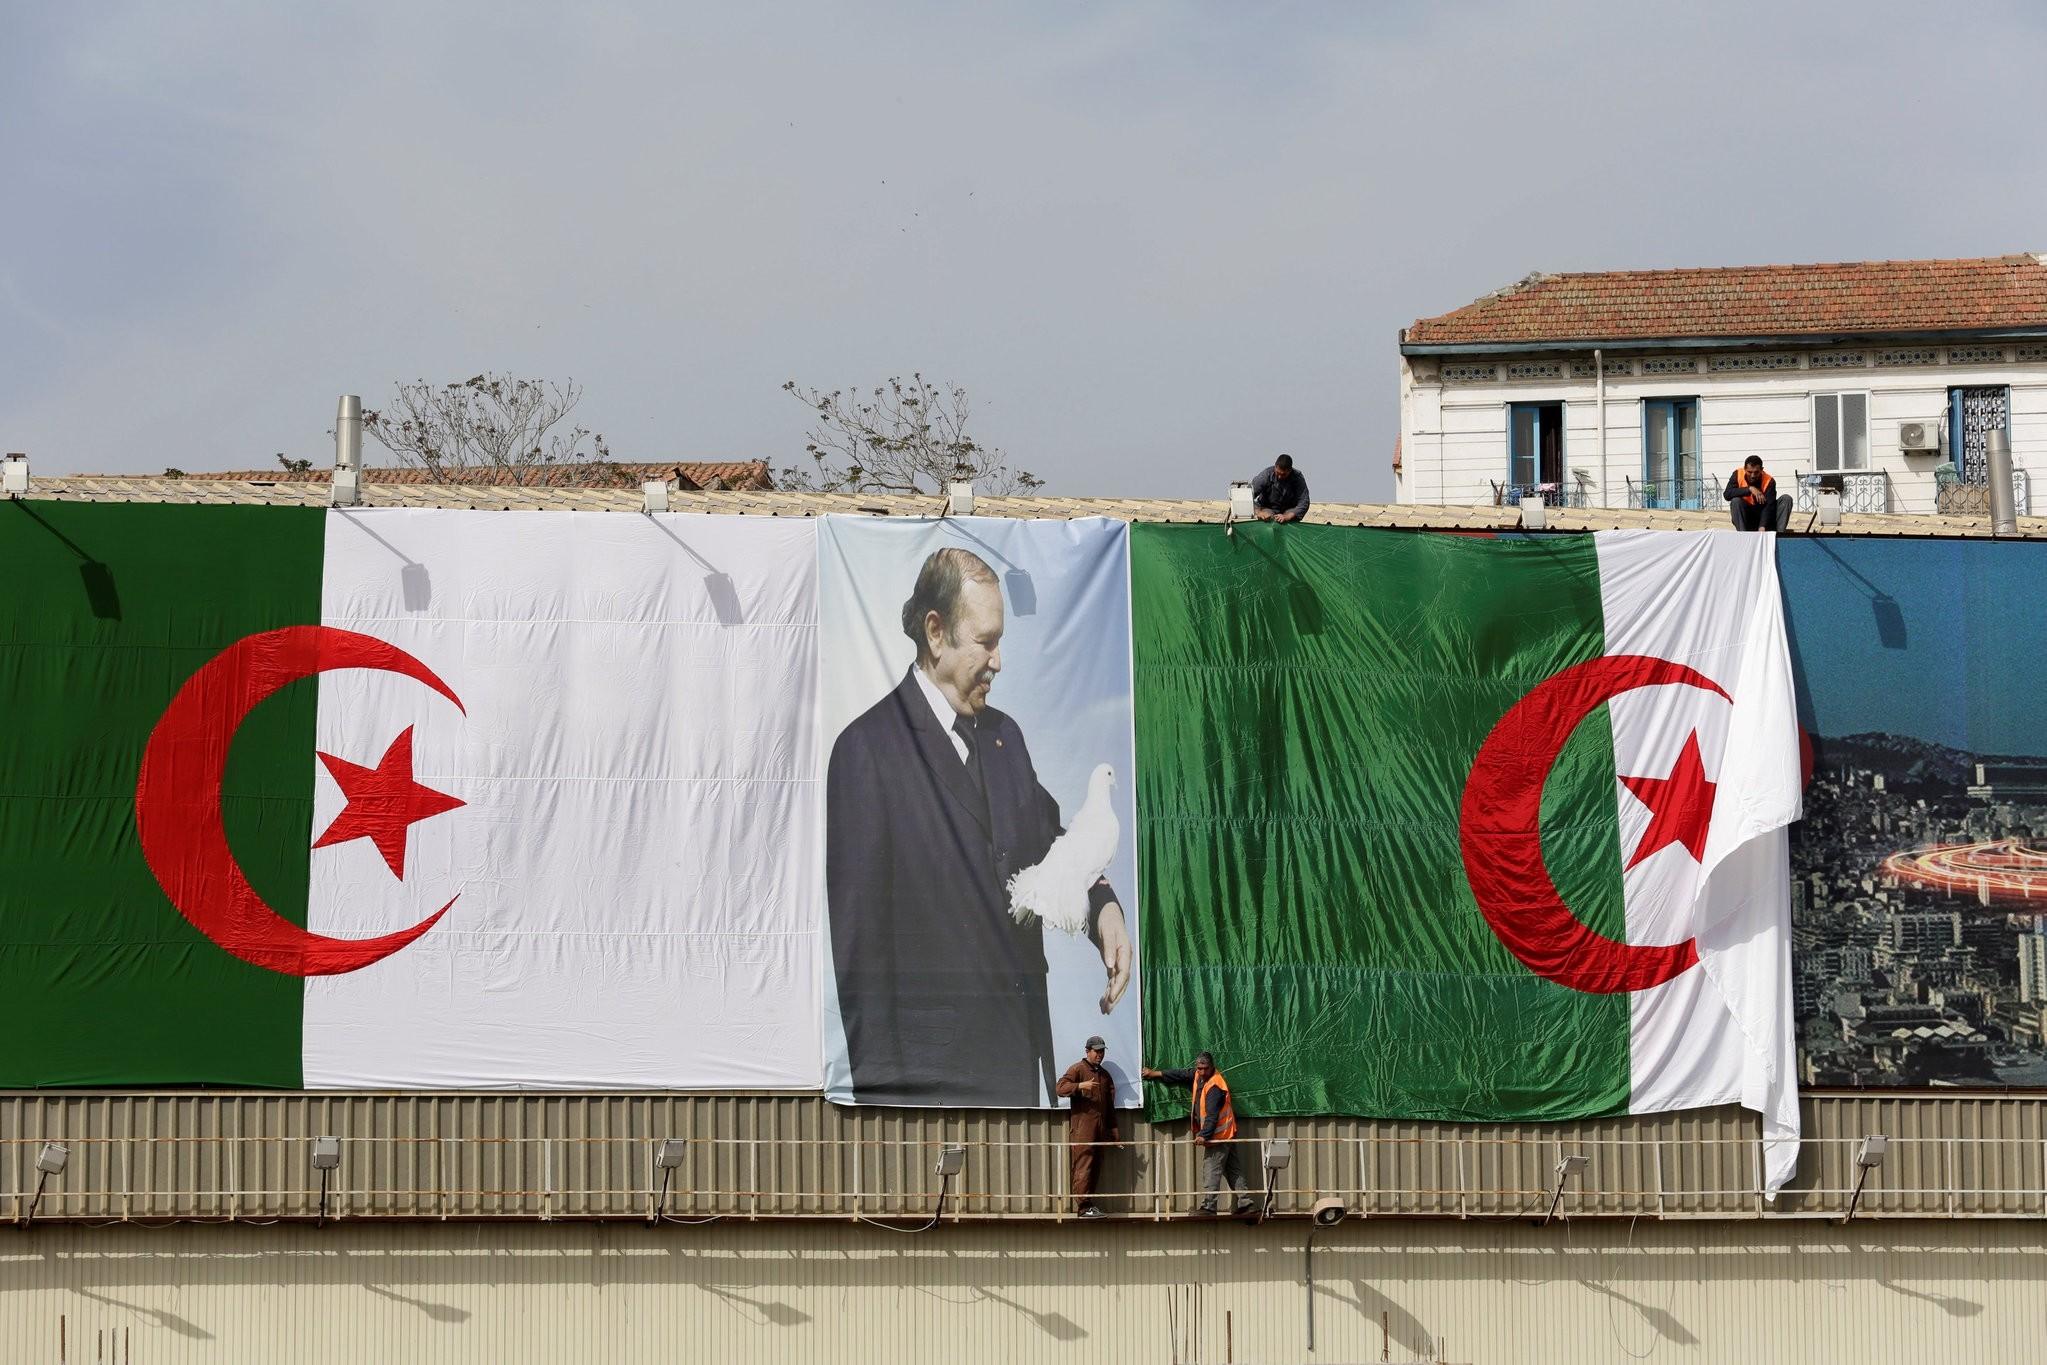 Algerian city employees install Algerian flags and President's Abdelaziz Bouteflika poster on the streets. (REUTERS Photo)